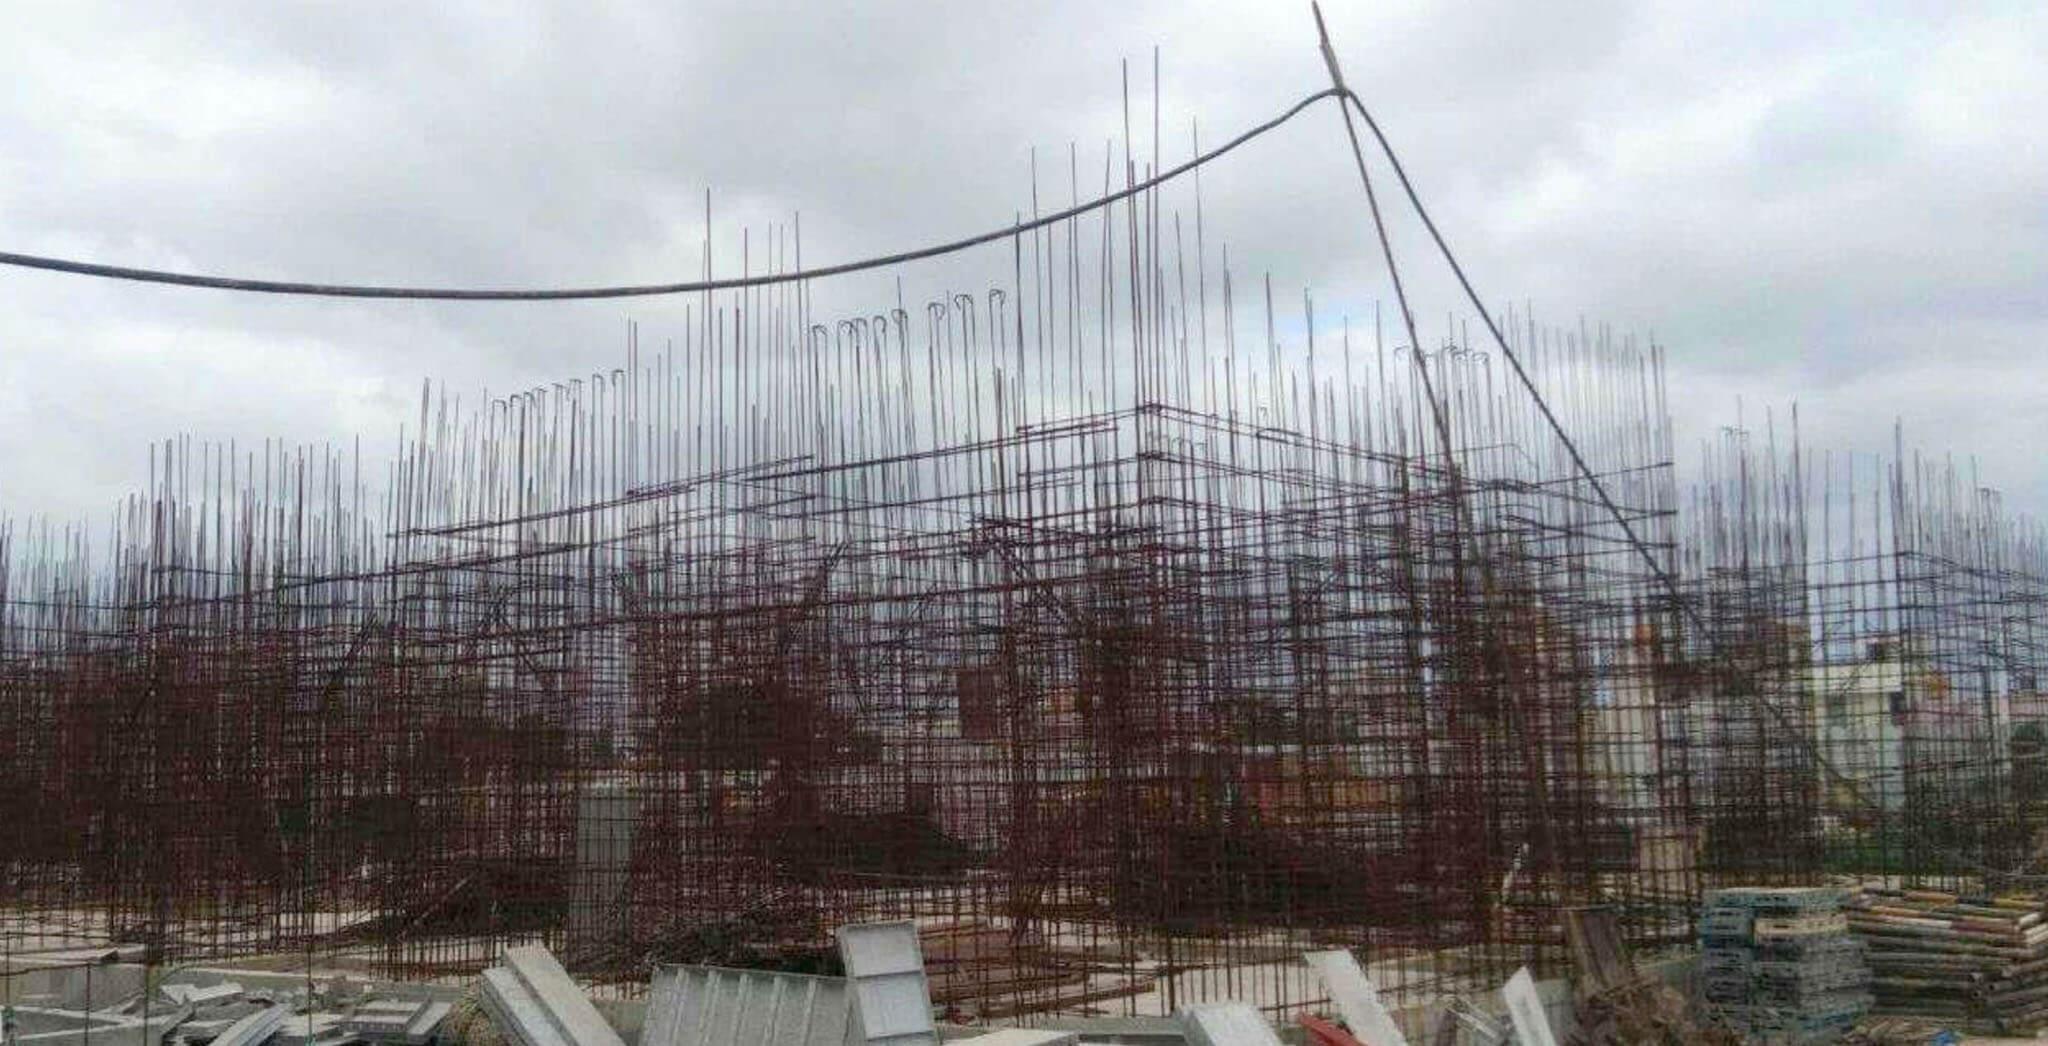 Aug 2019 - M Block: First floor wall reinforcement work-in-progress